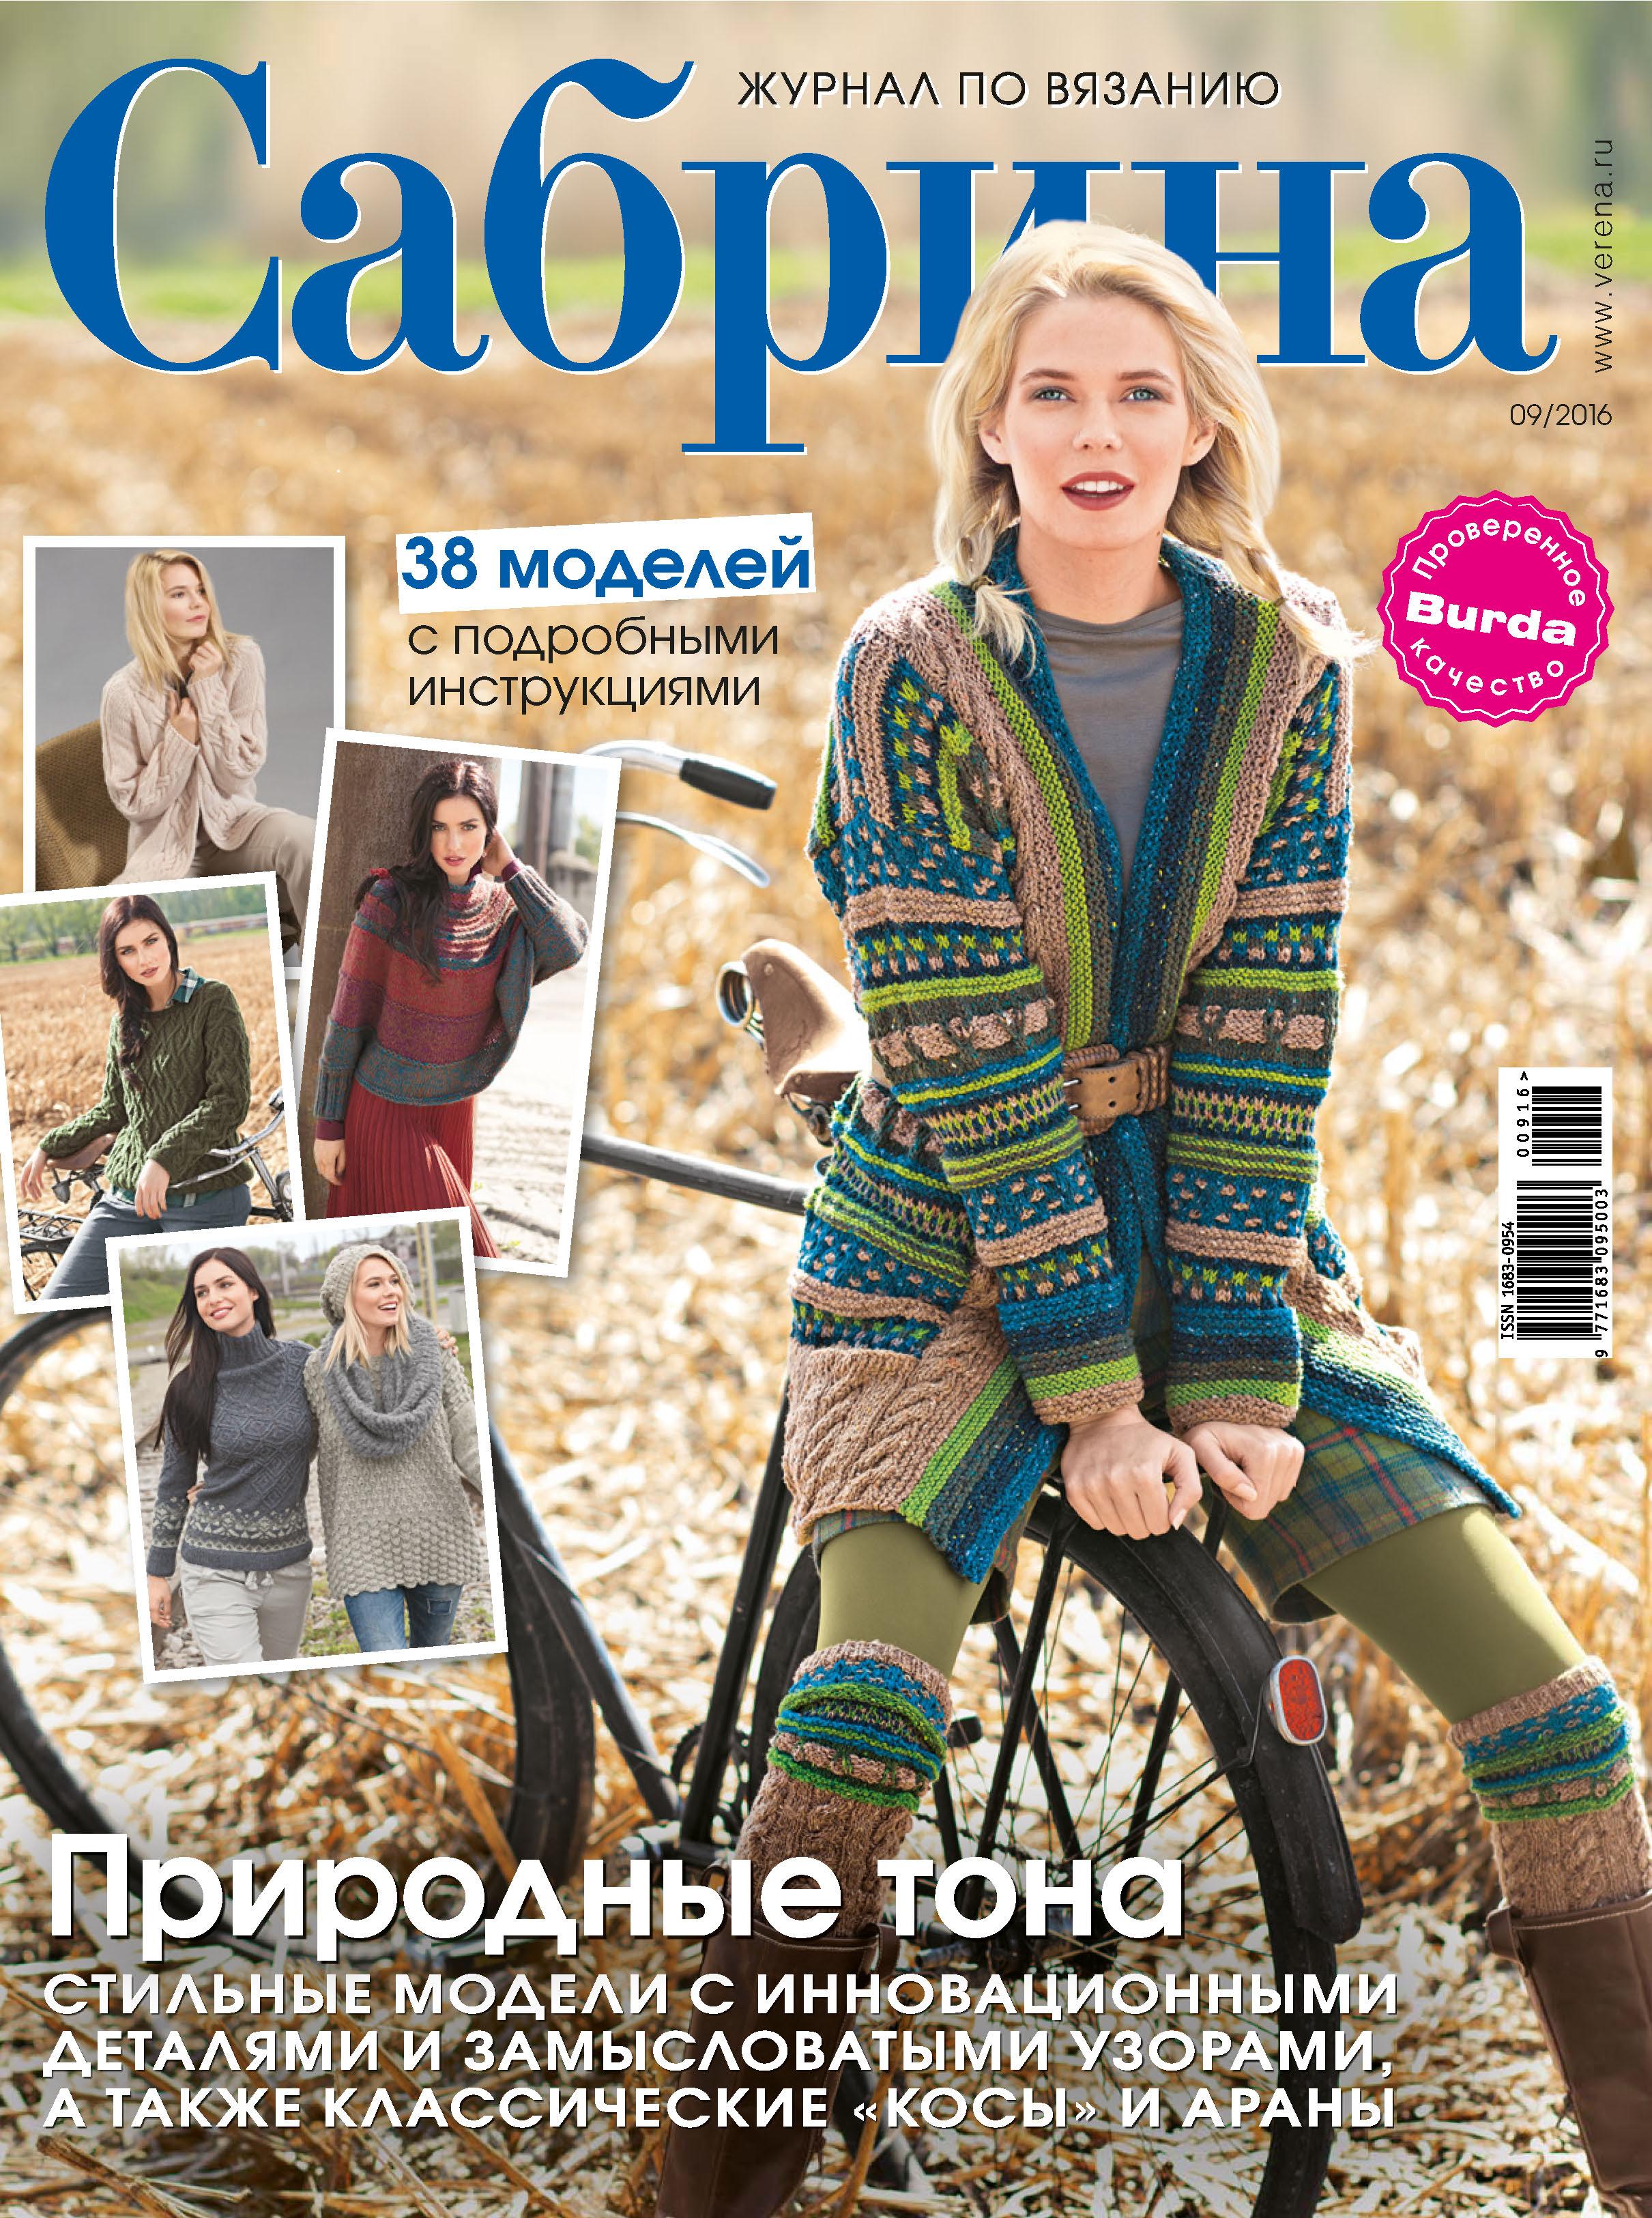 ИД «Бурда» Сабрина. Журнал по вязанию. №09/2016